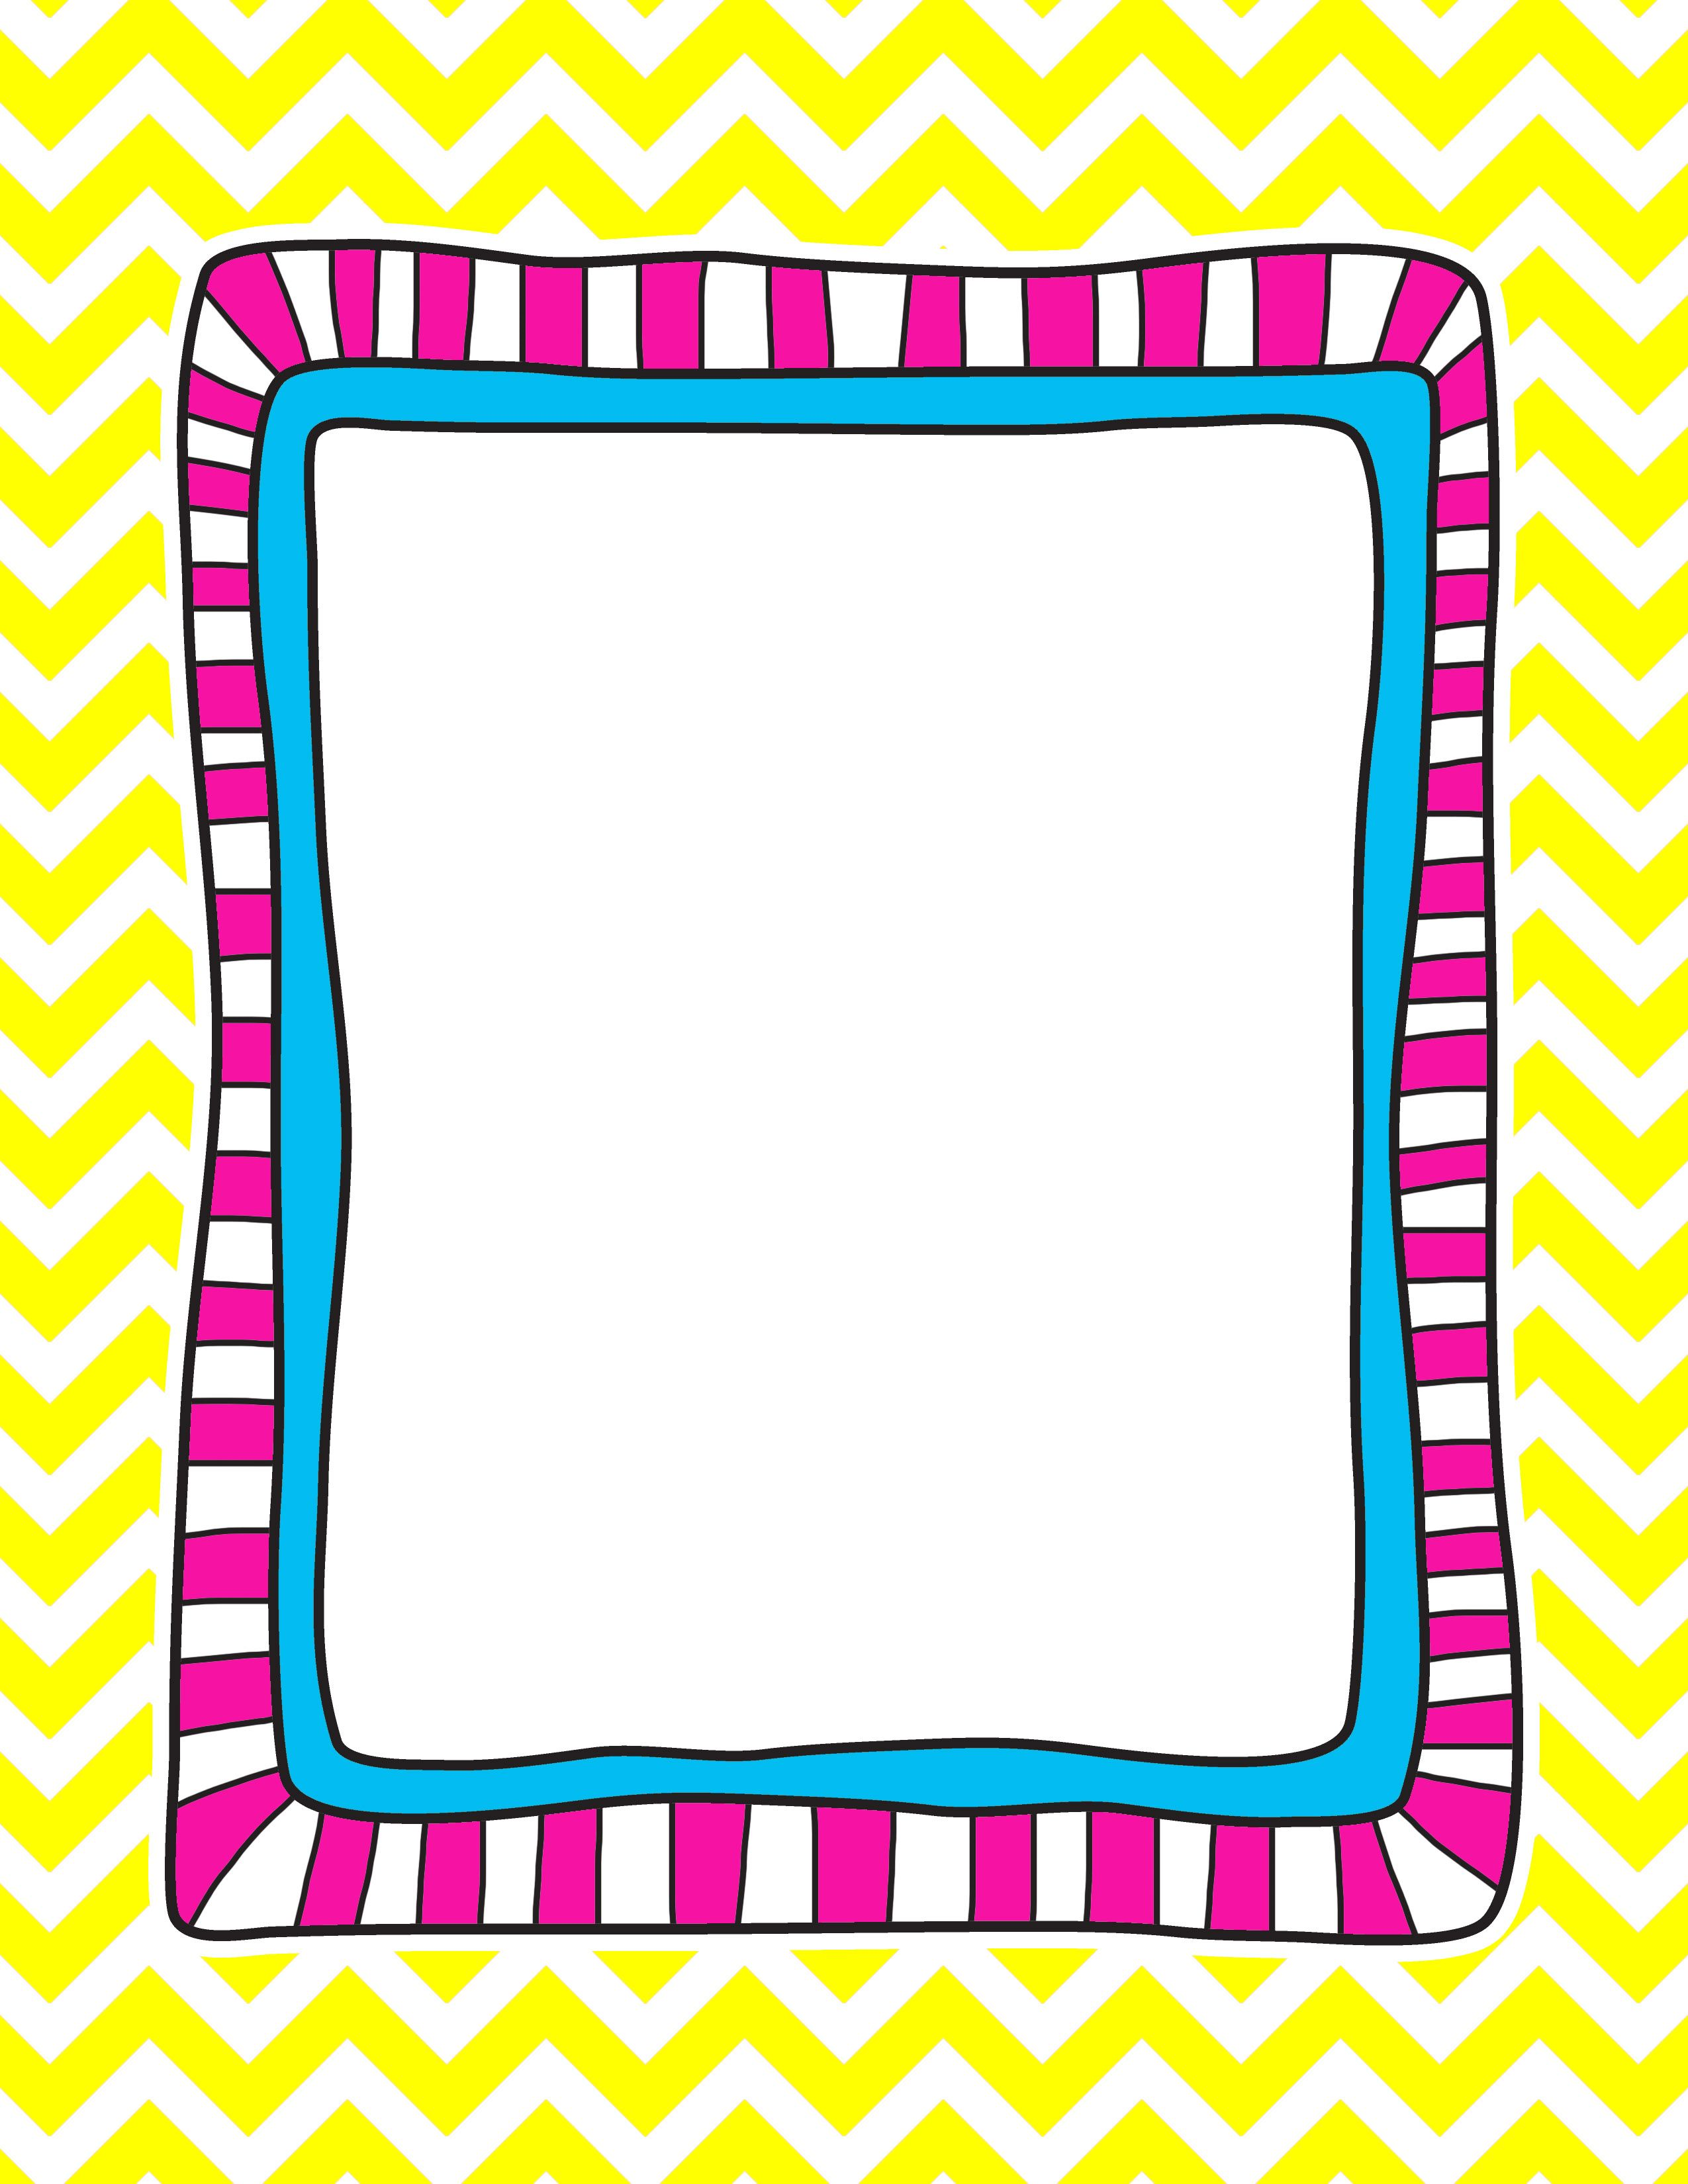 Frame marcos frame pinterest marcos bordes y - Marcos decorativos ...